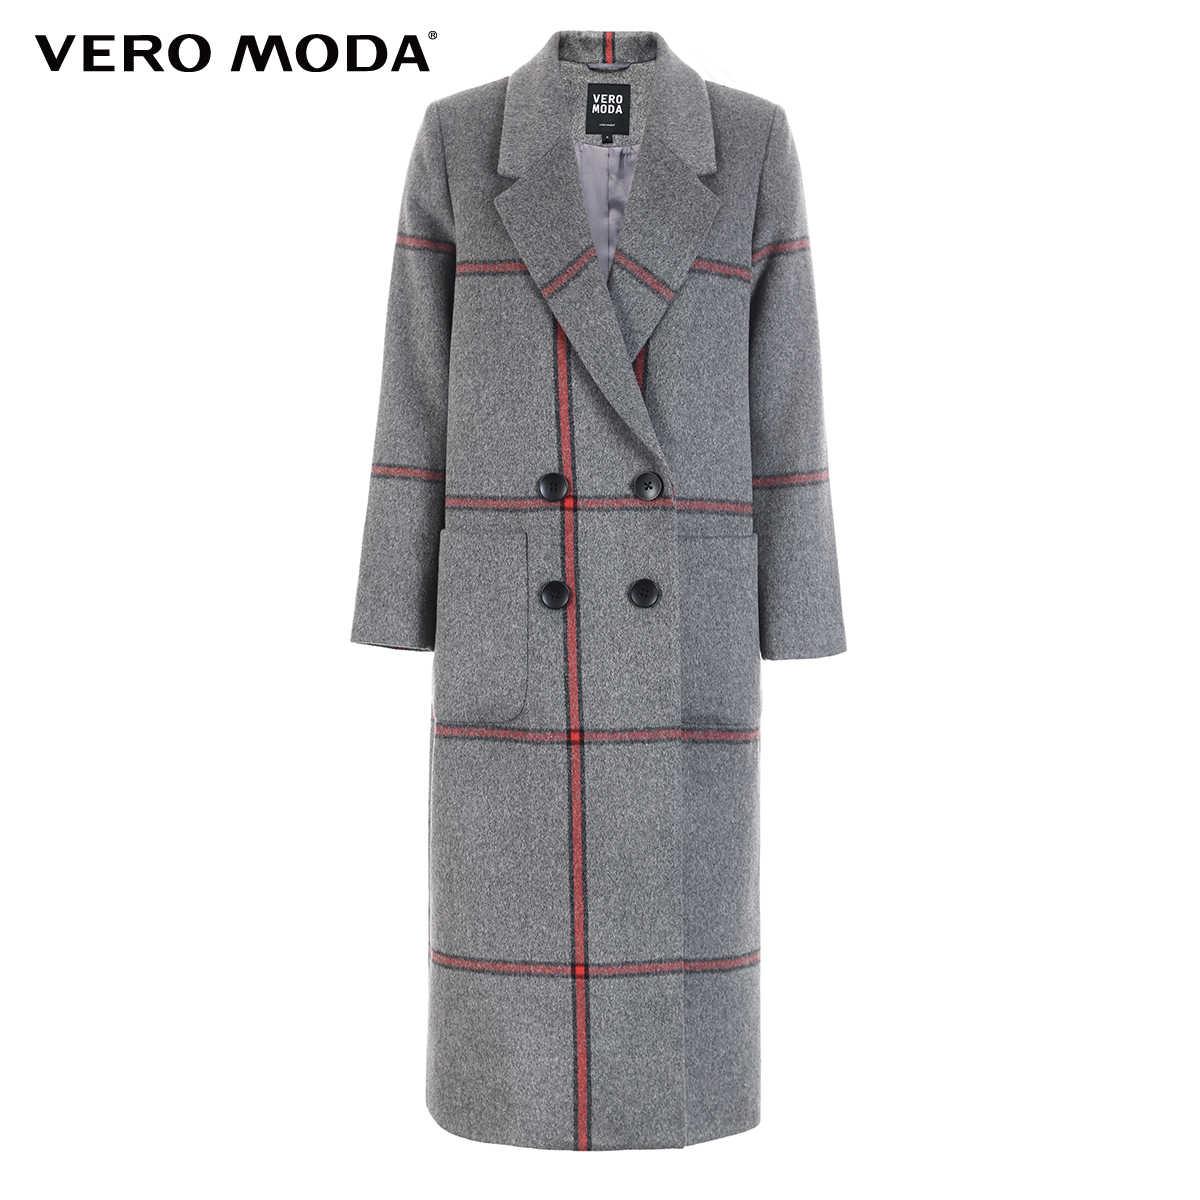 Vero Moda Women's New 61% Wool Colorblock Buttoned Plaid Wool Coat | 318327513